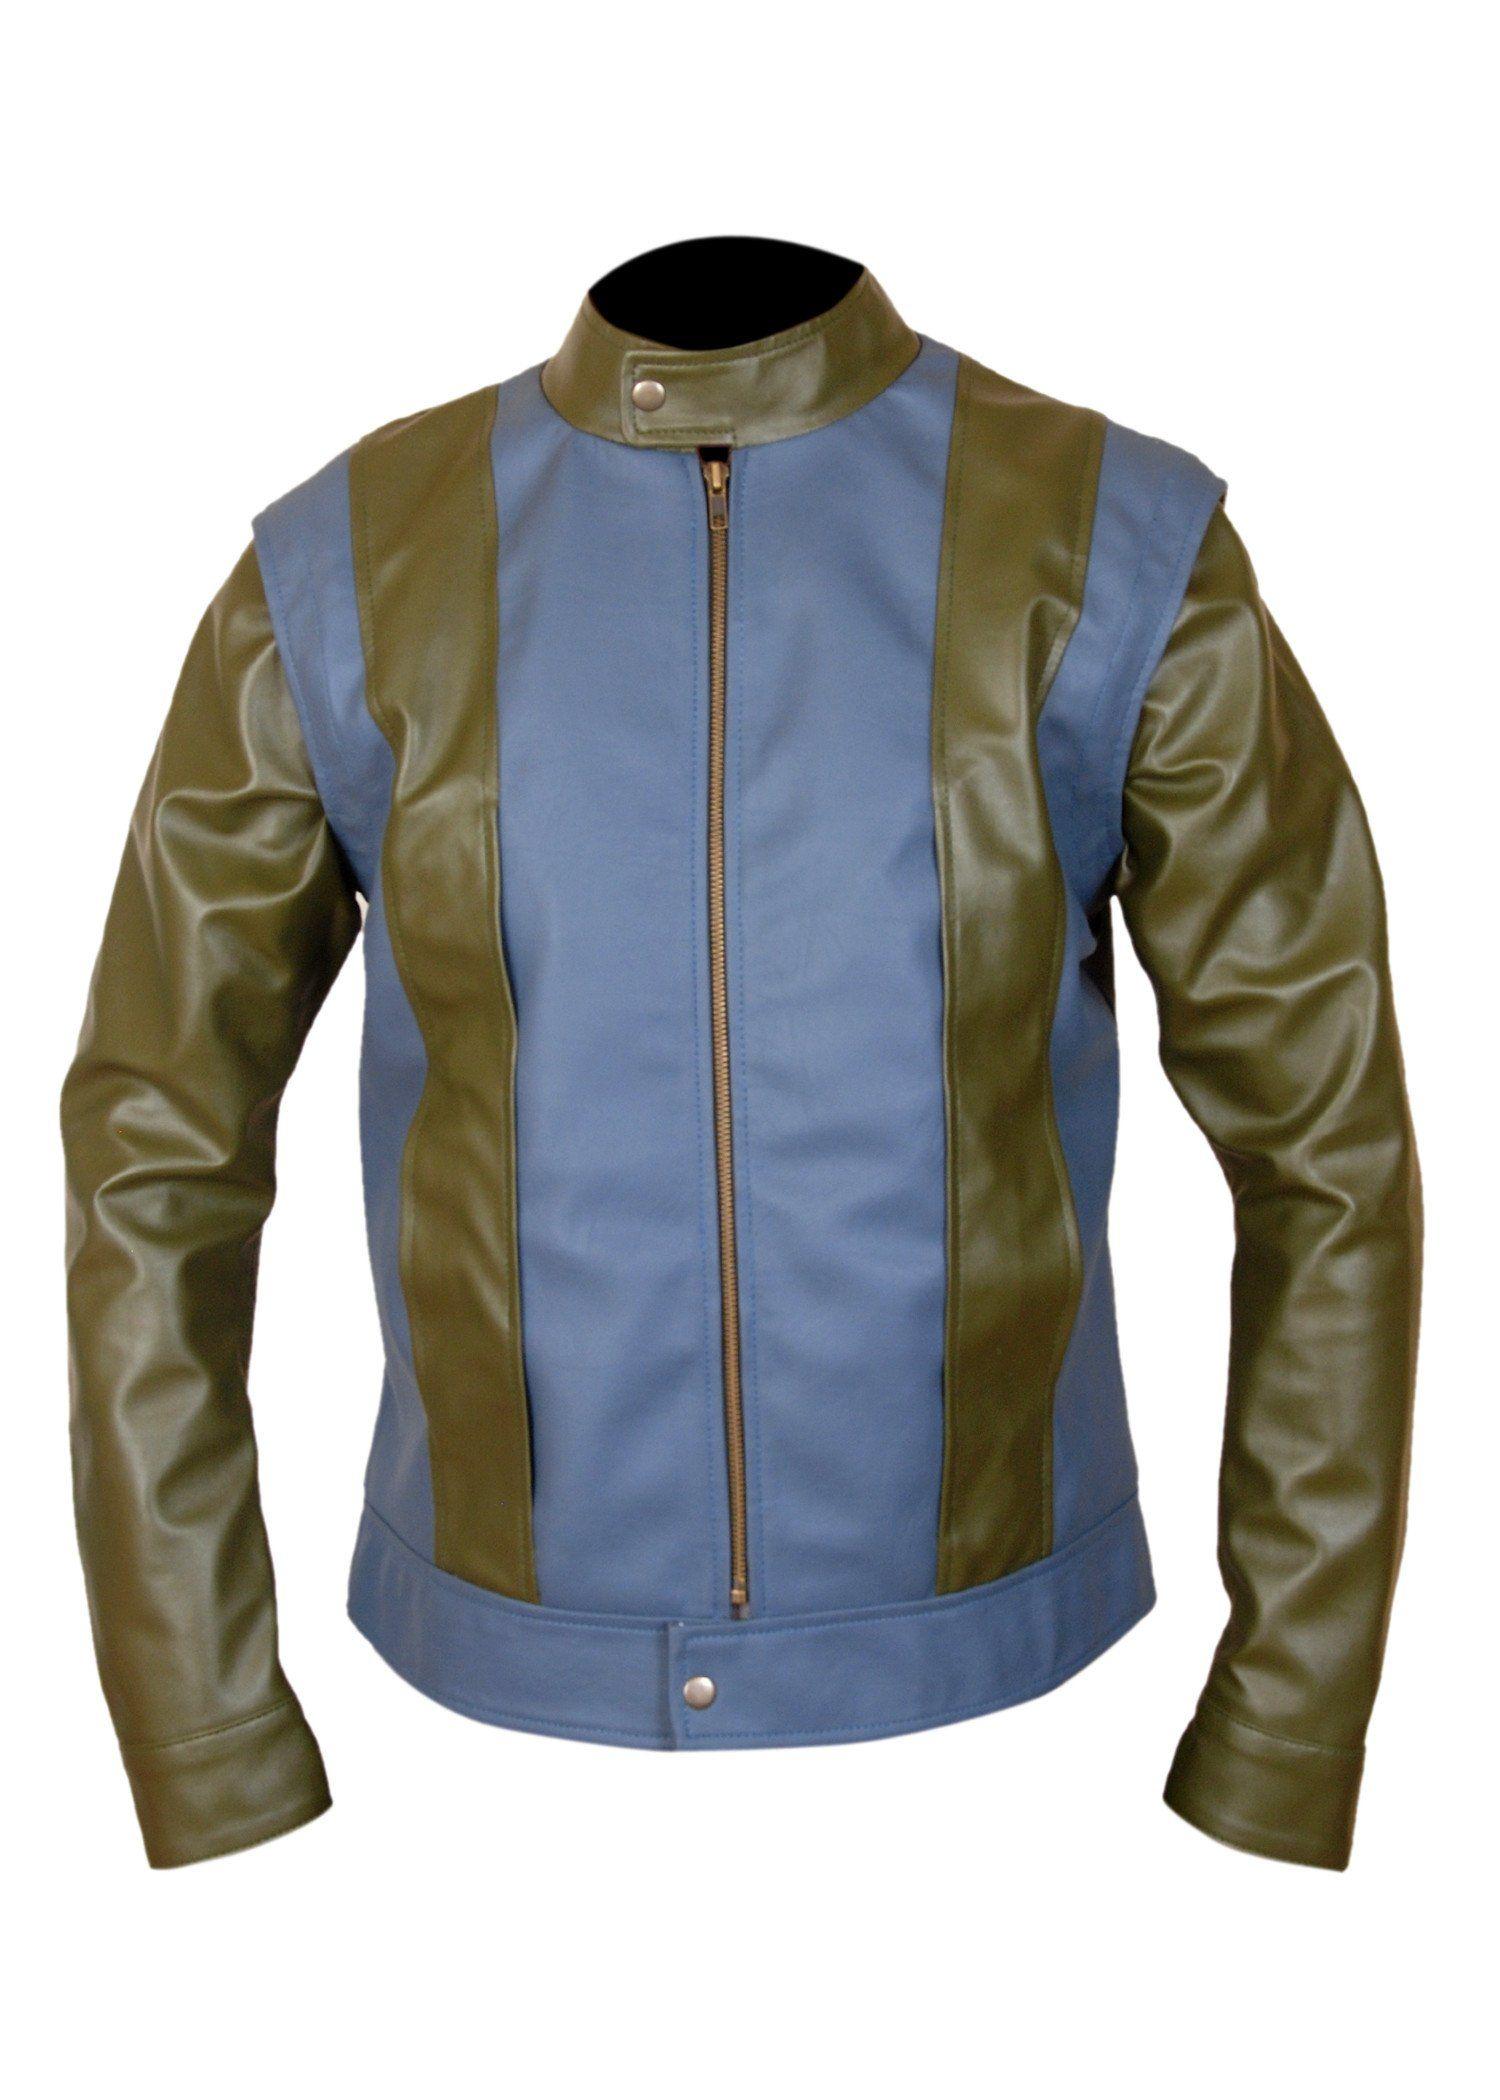 F H Boy S X Men Apocalypse Scott Summers Cyclops Jacket Xl Multi Premium Quality Synthetic Leather Polyester Satin Polyester Satin X Men Apocalypse Jackets [ 2100 x 1500 Pixel ]